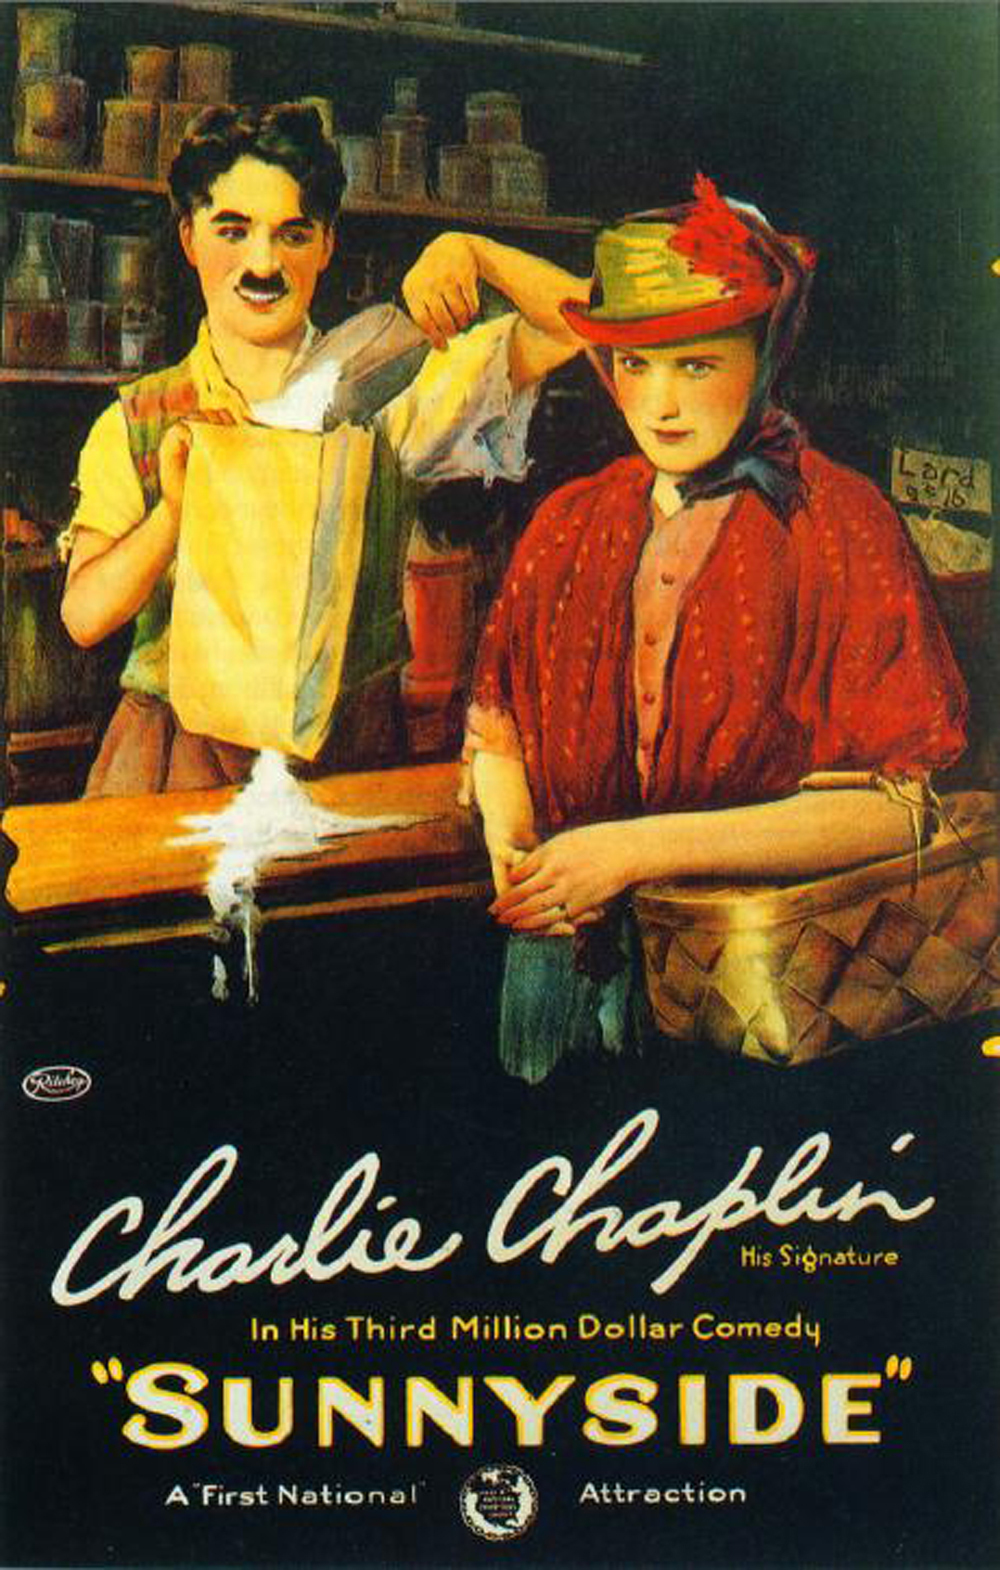 Charlie Chaplin in